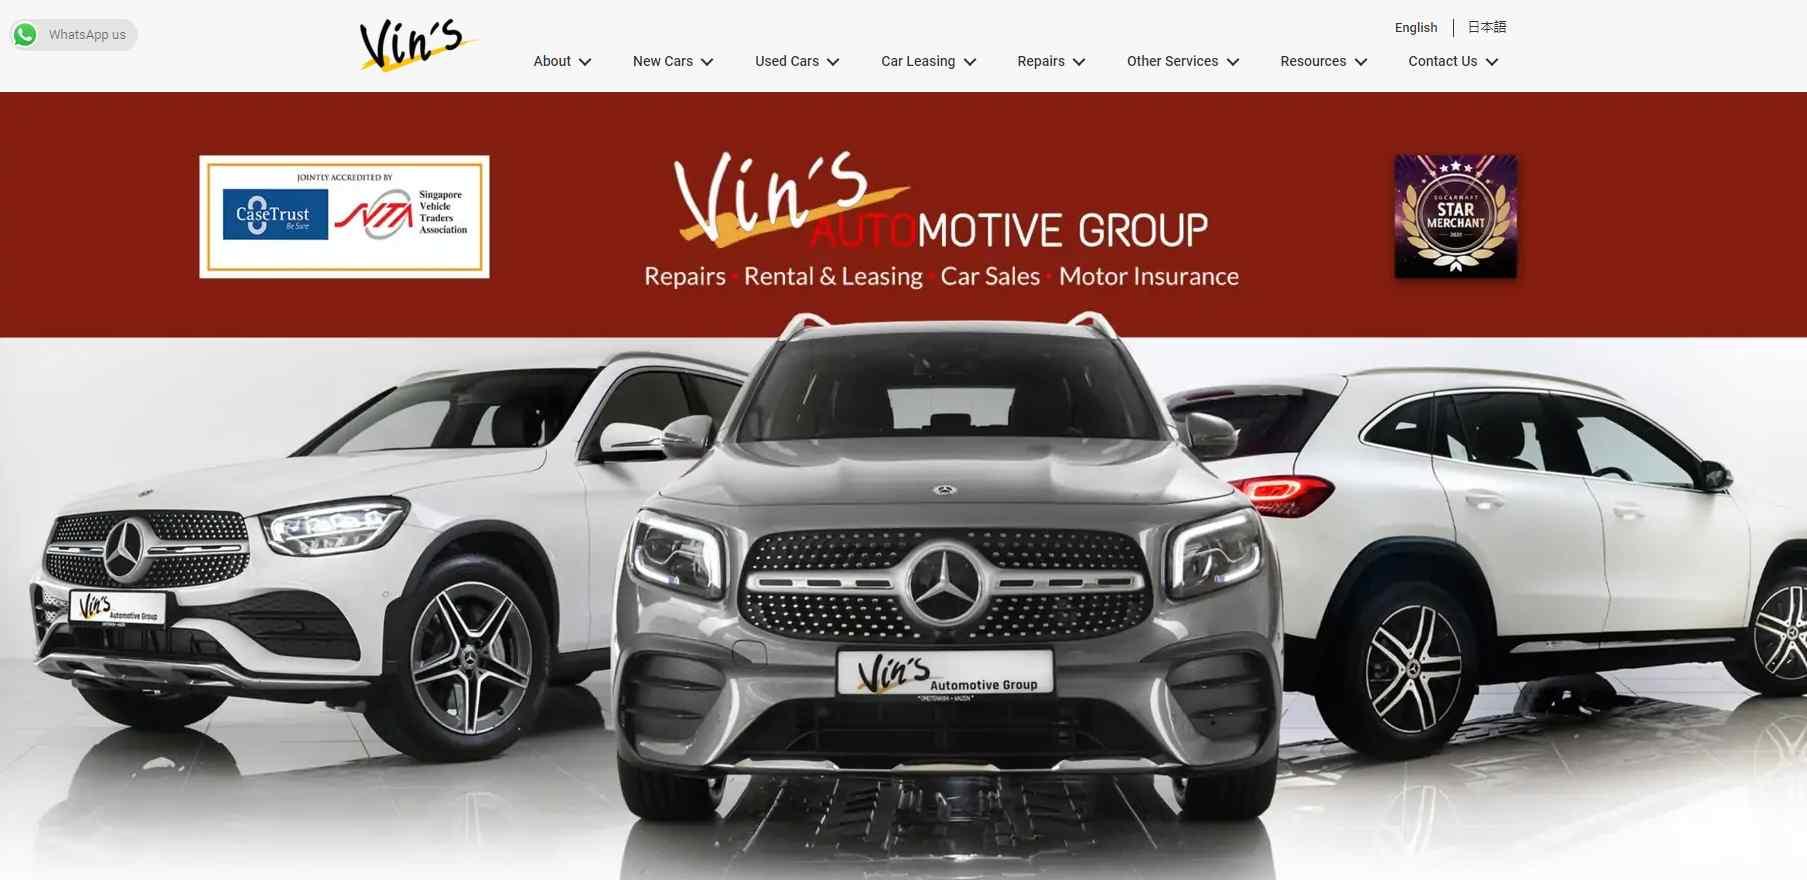 vins auto Top Car Servicing Workshops in Singapore